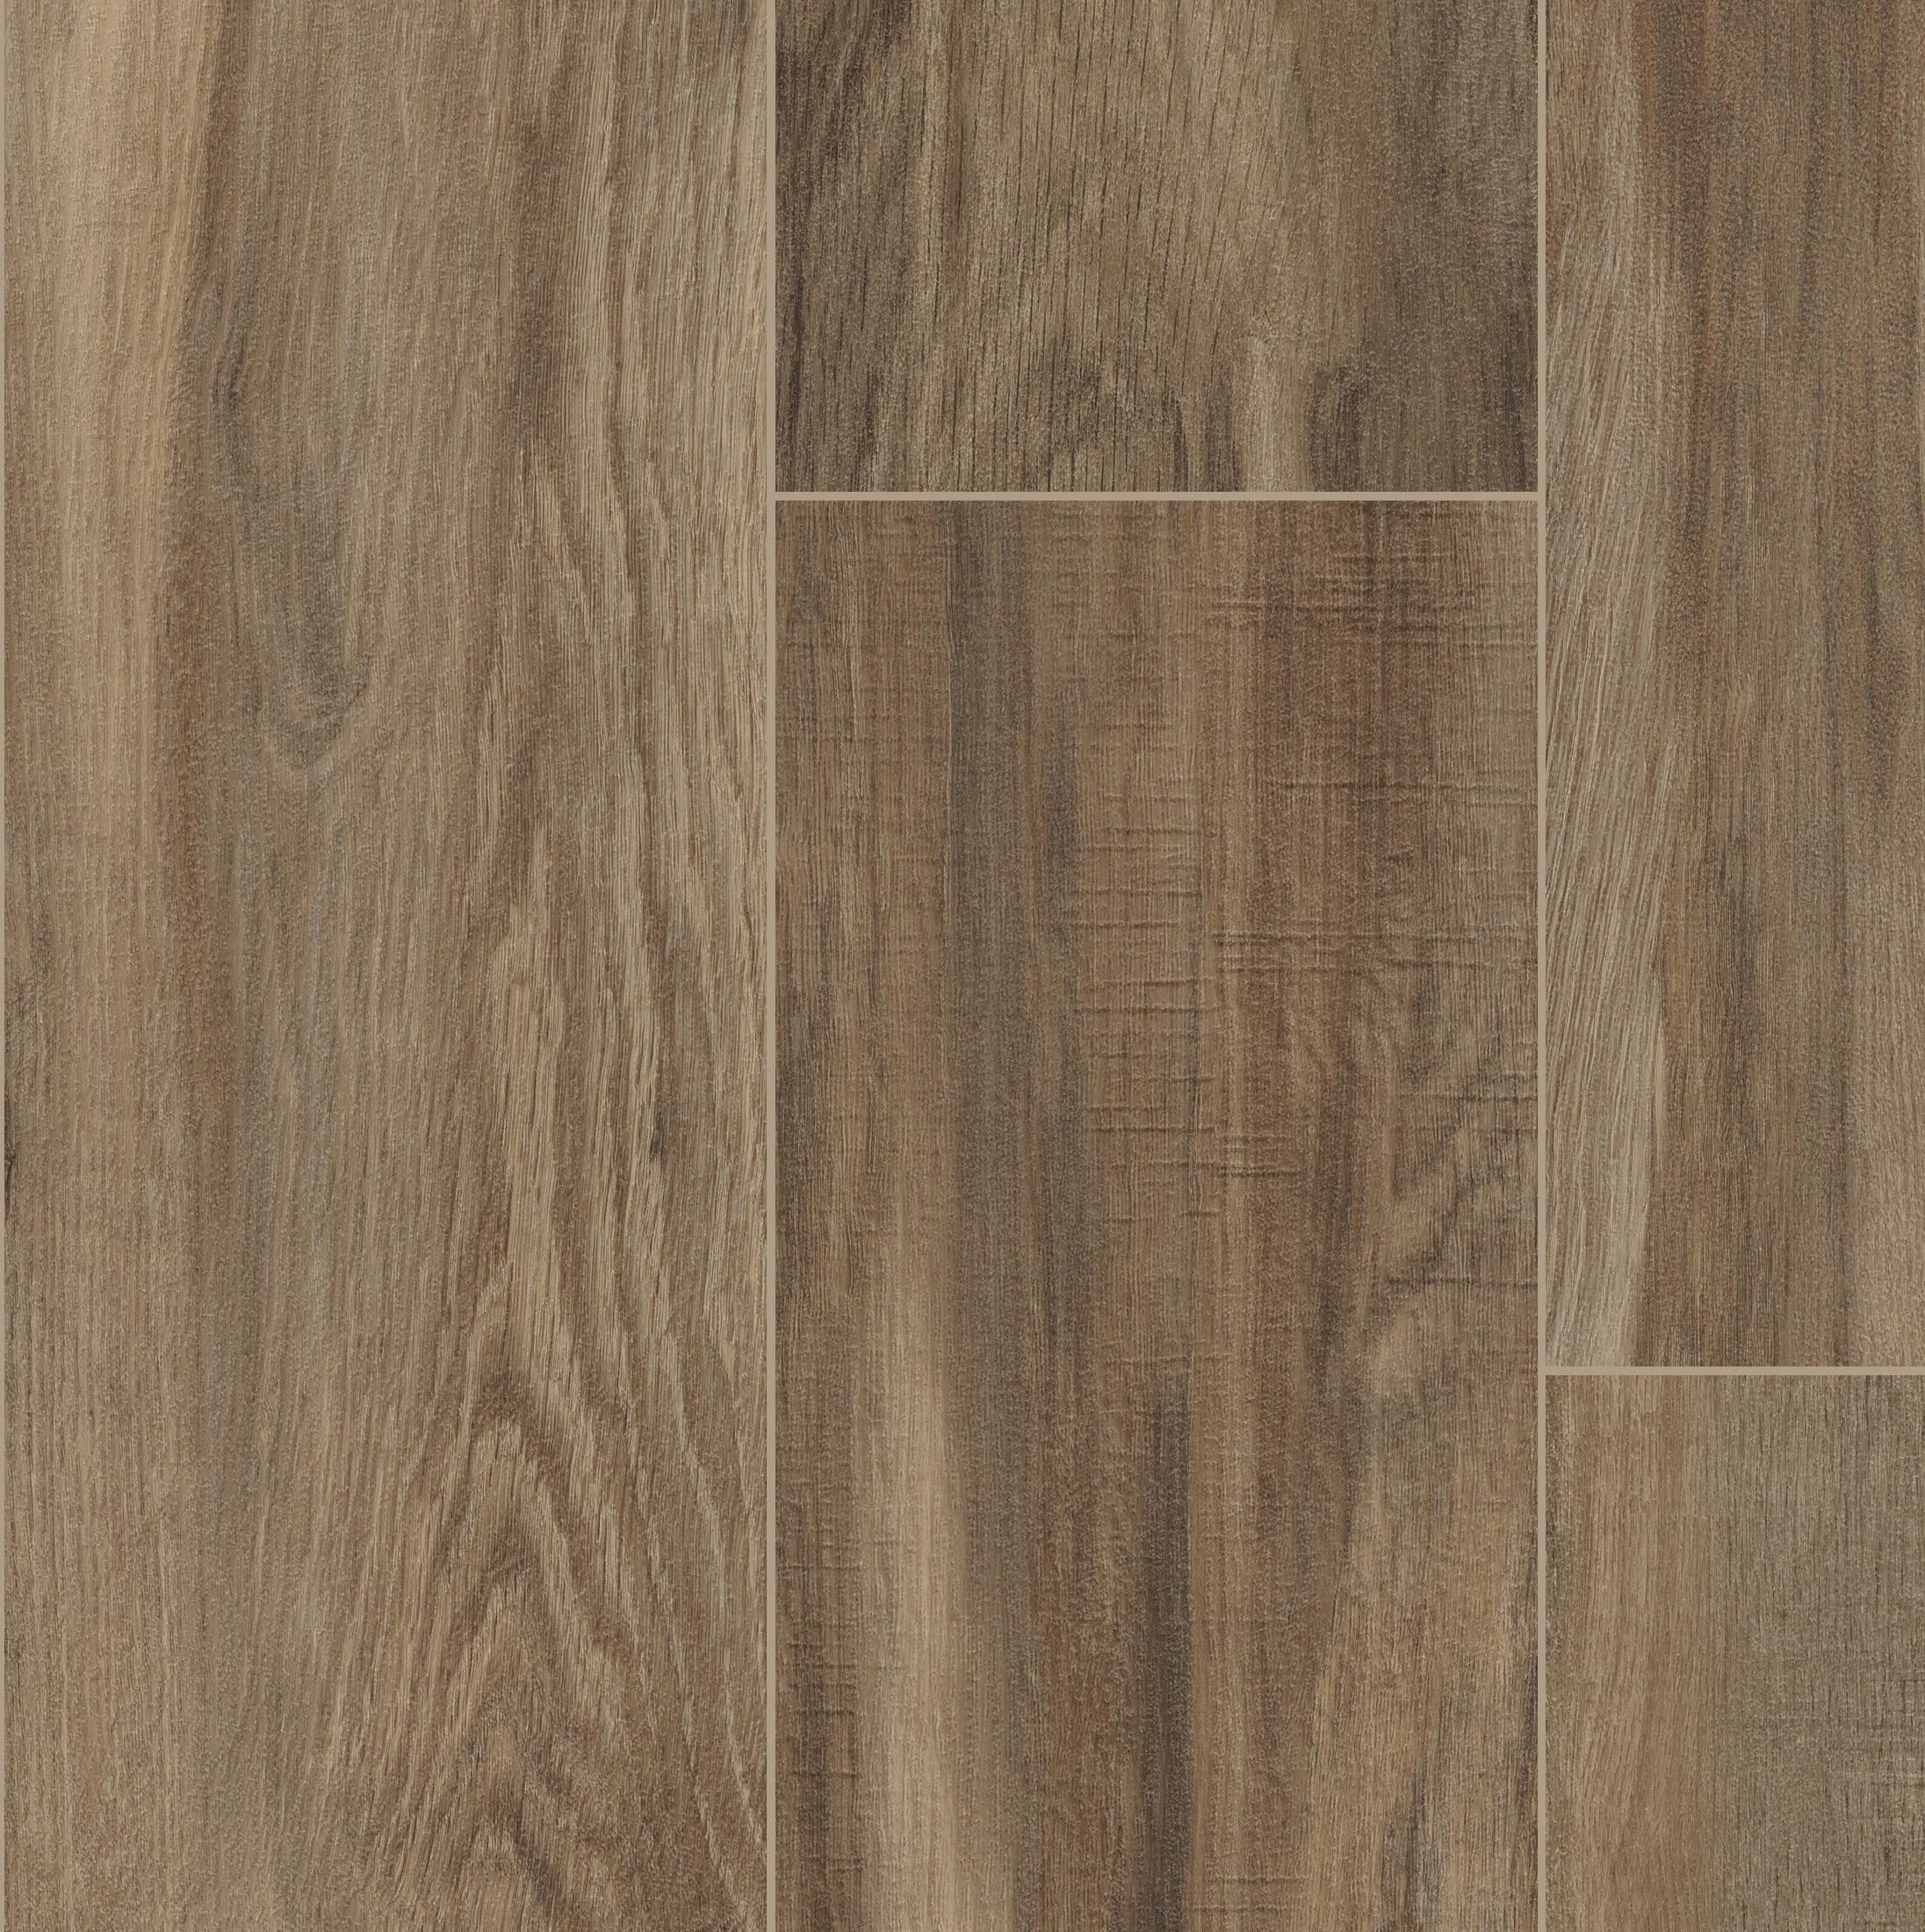 vinyl hardwood flooring vs laminate of mohawk amber 9 wide glue down luxury vinyl plank flooring for 330 8 78 x 70 55 approved